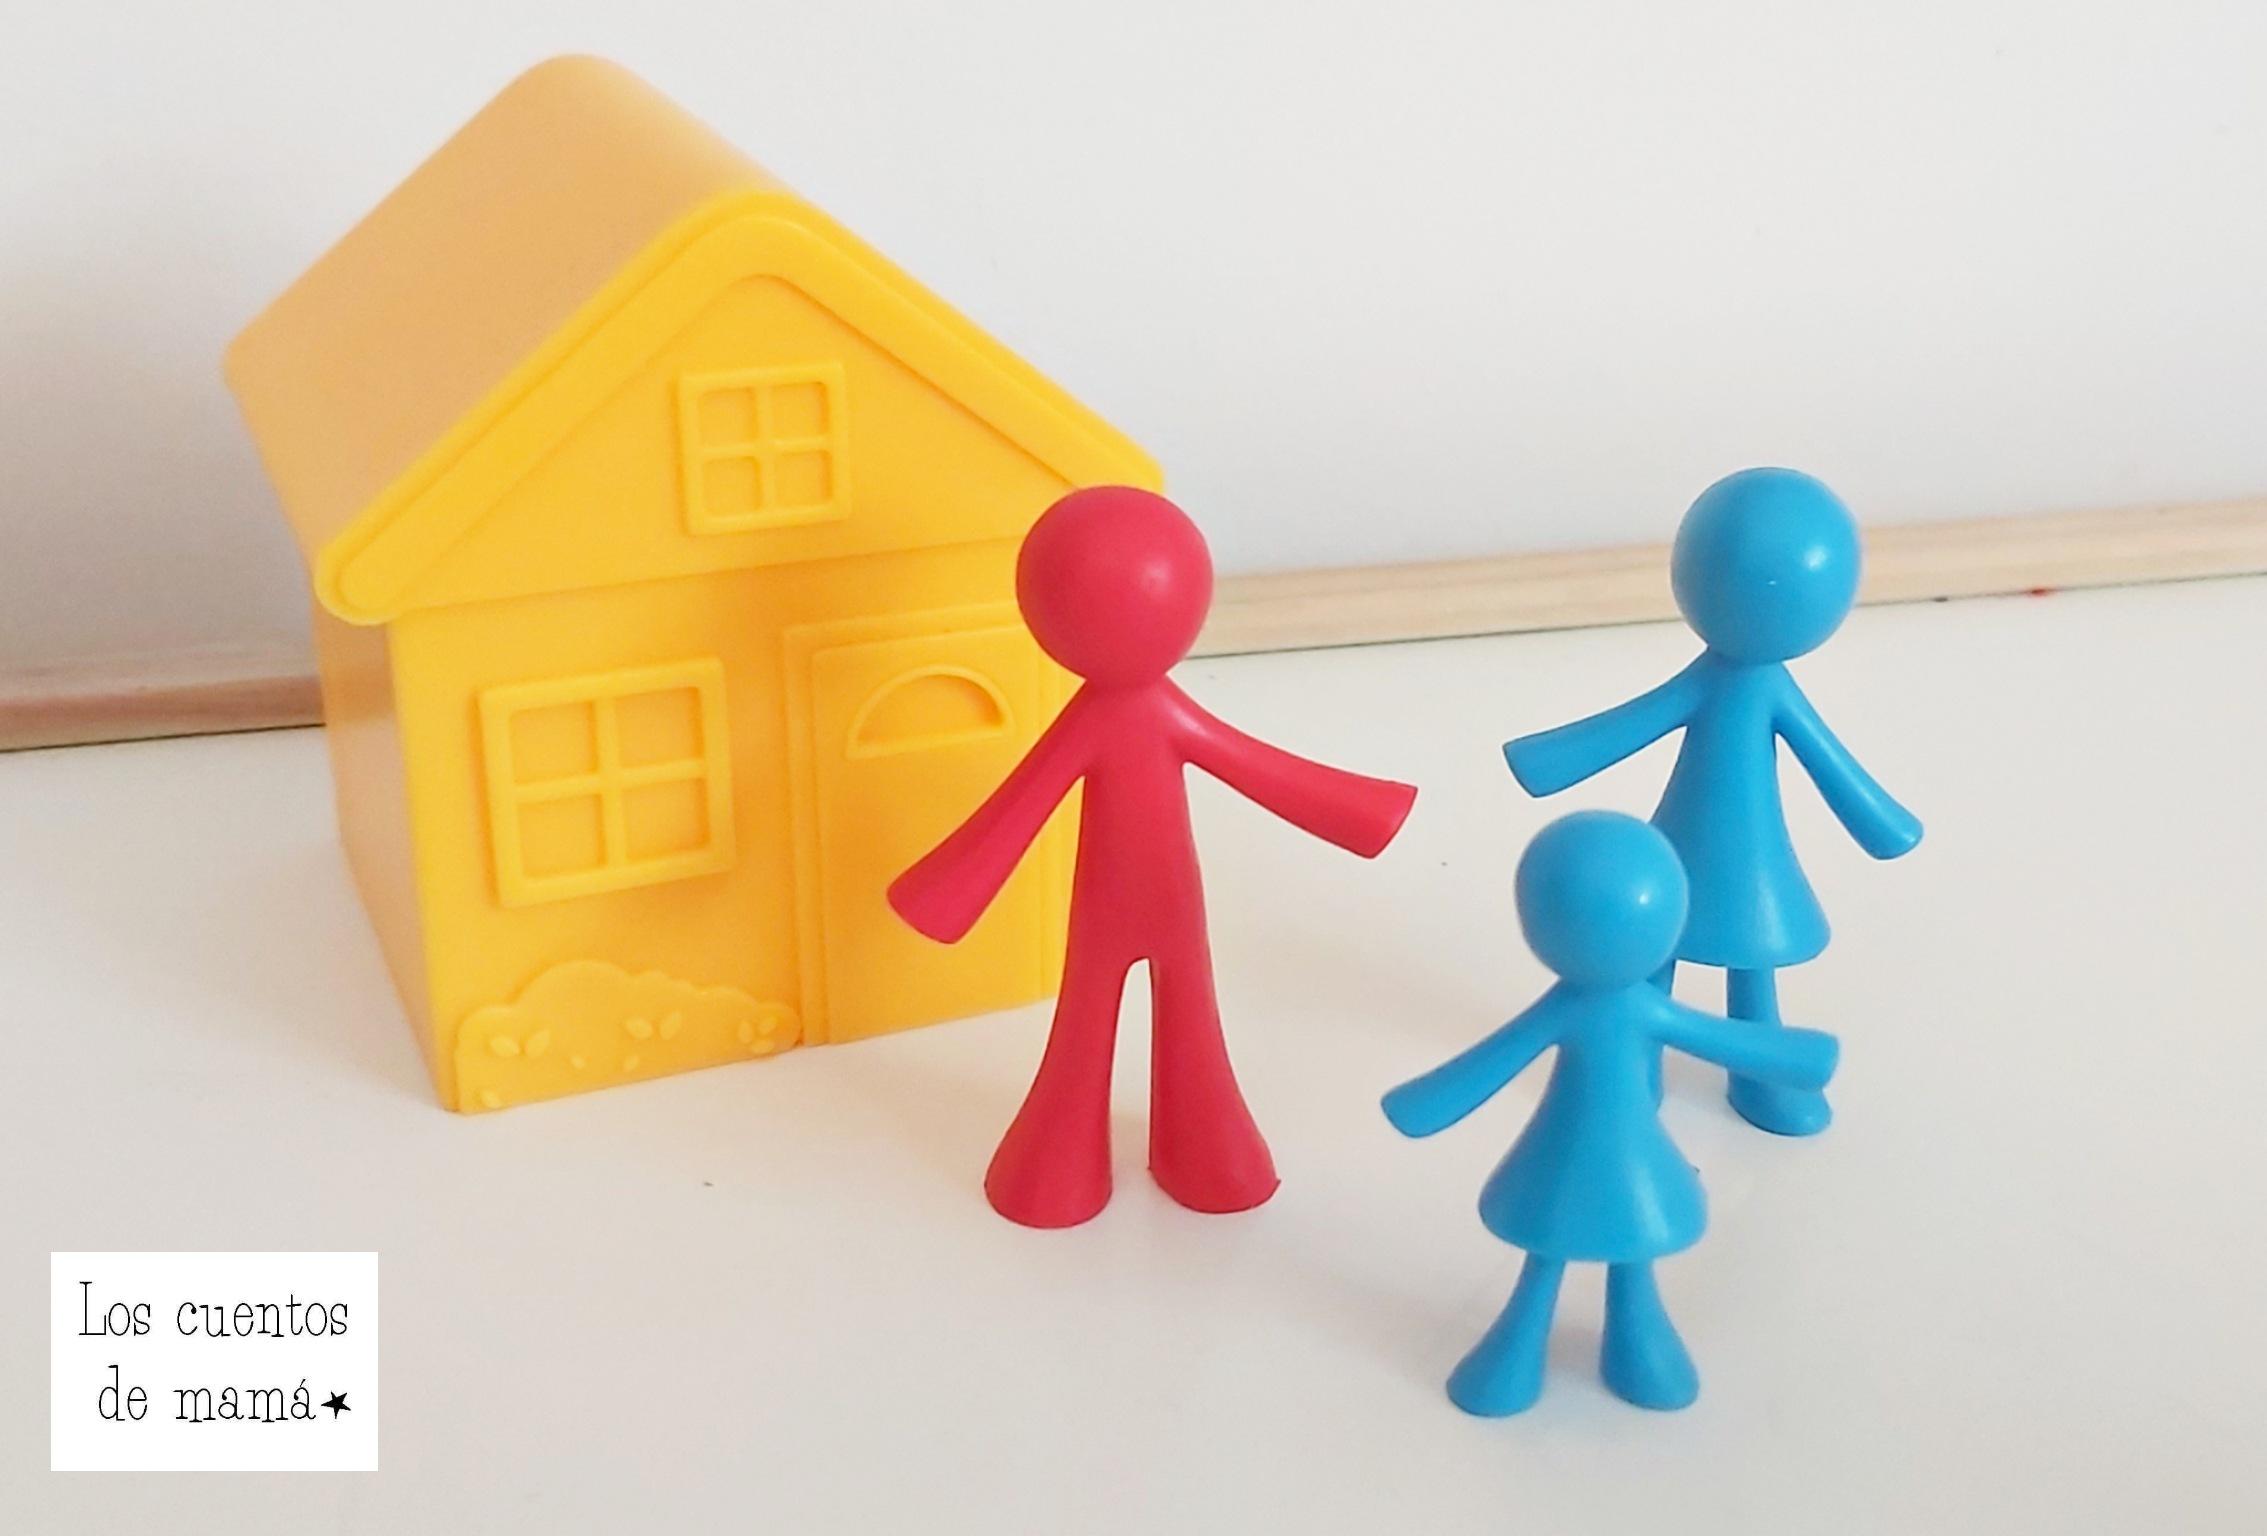 juguetes educativos para aprender sobre diversidad familiar